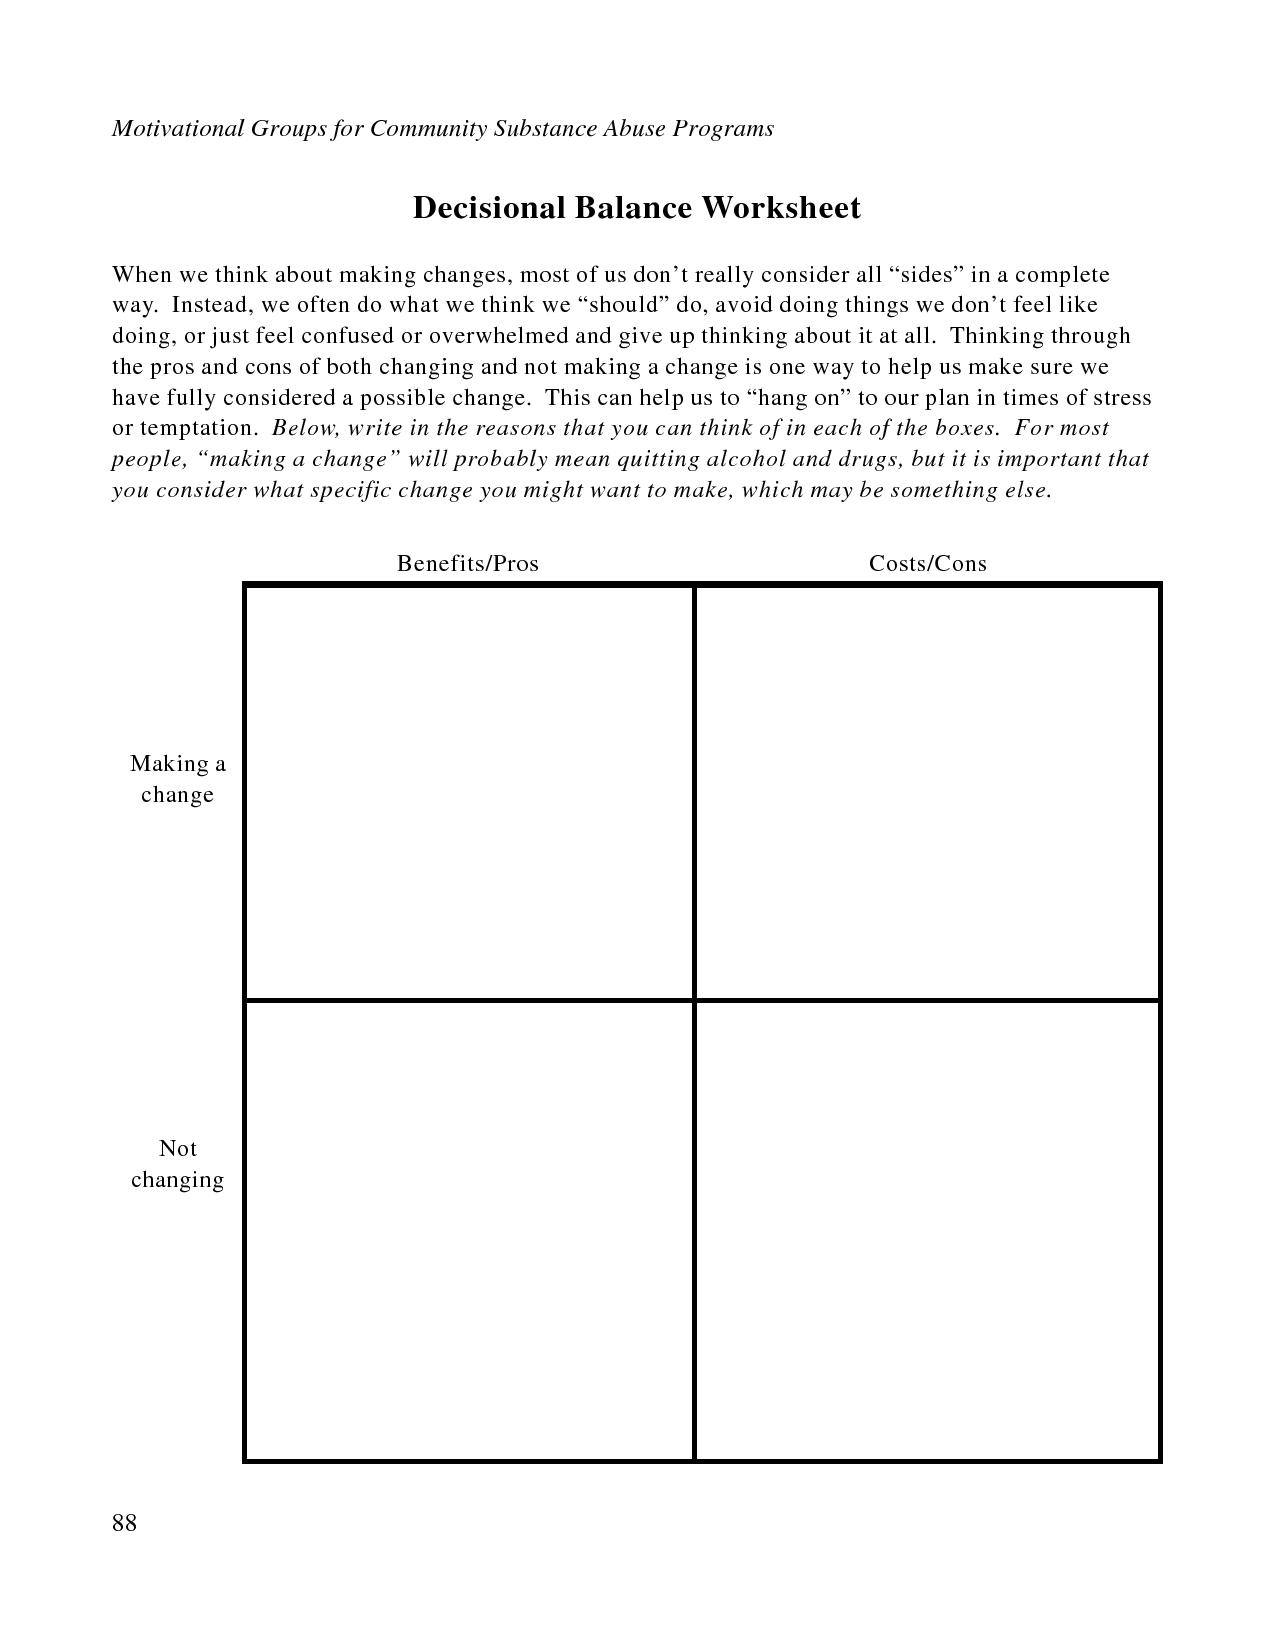 Free Printable Dbt Worksheets   Decisional Balance Worksheet - Pdf   Free Printable Counseling Worksheets